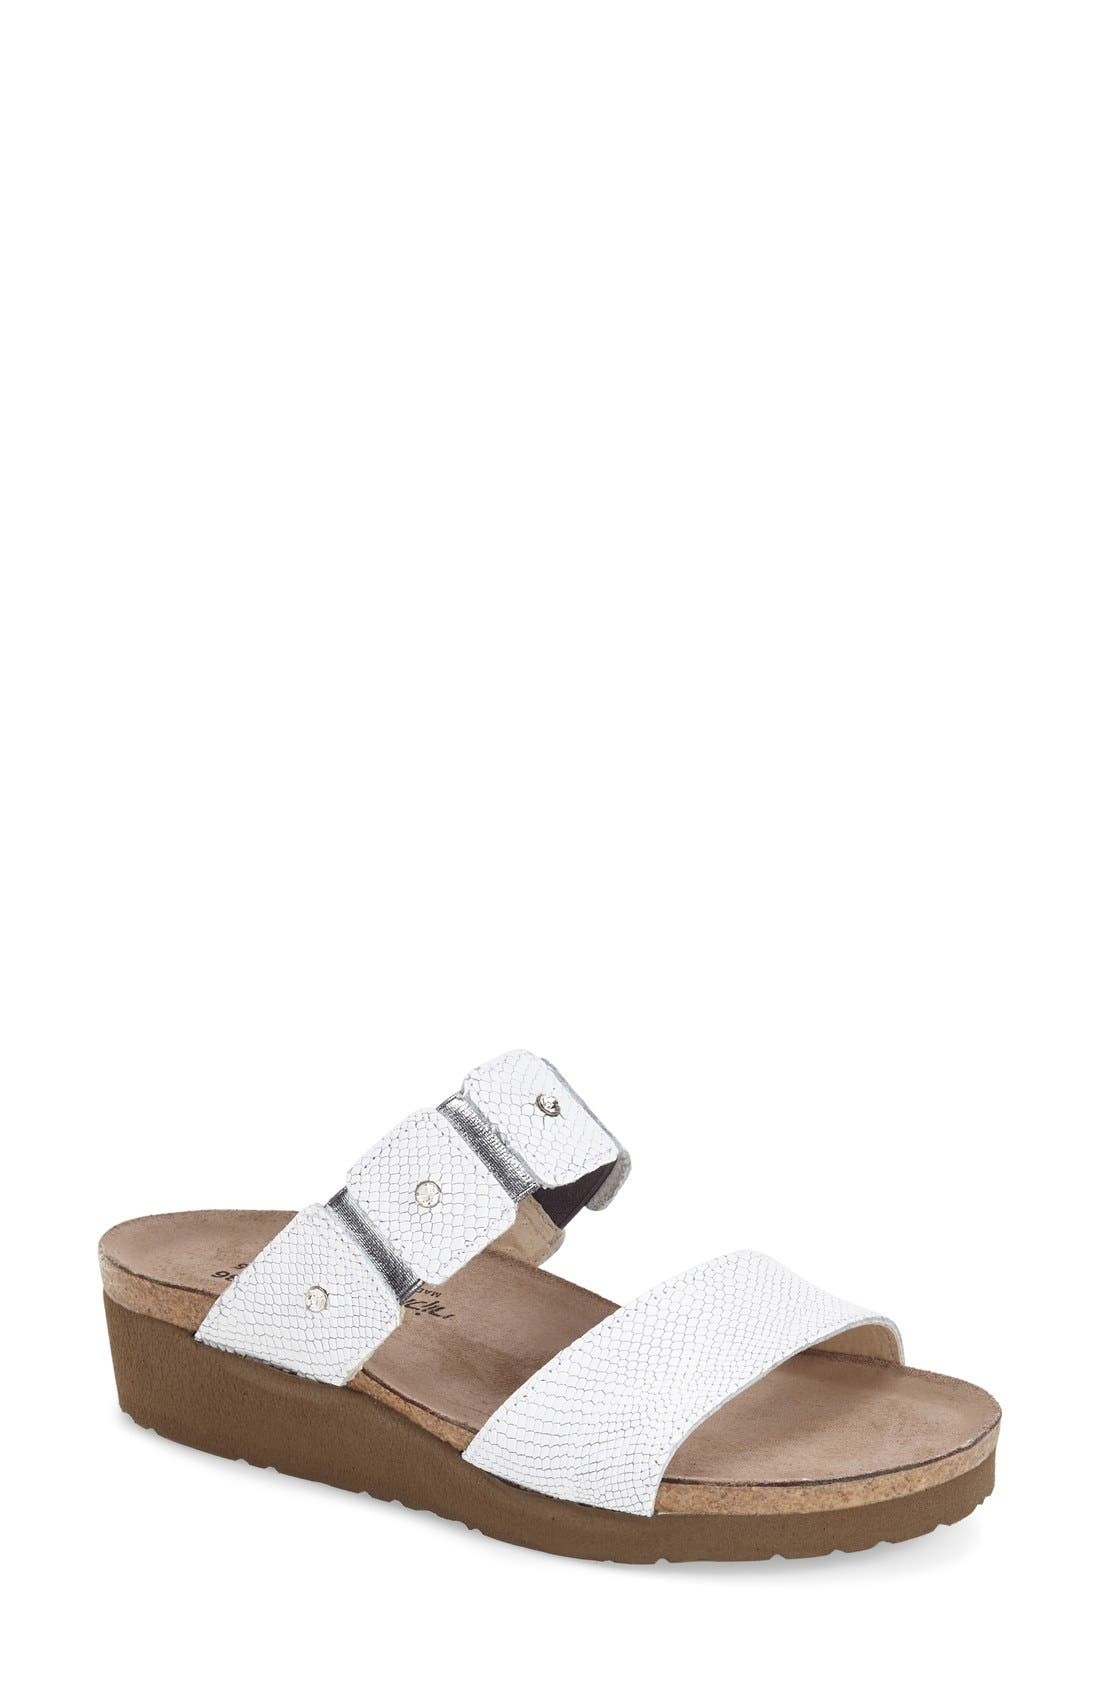 Main Image - Naot 'Ashley' Sandal